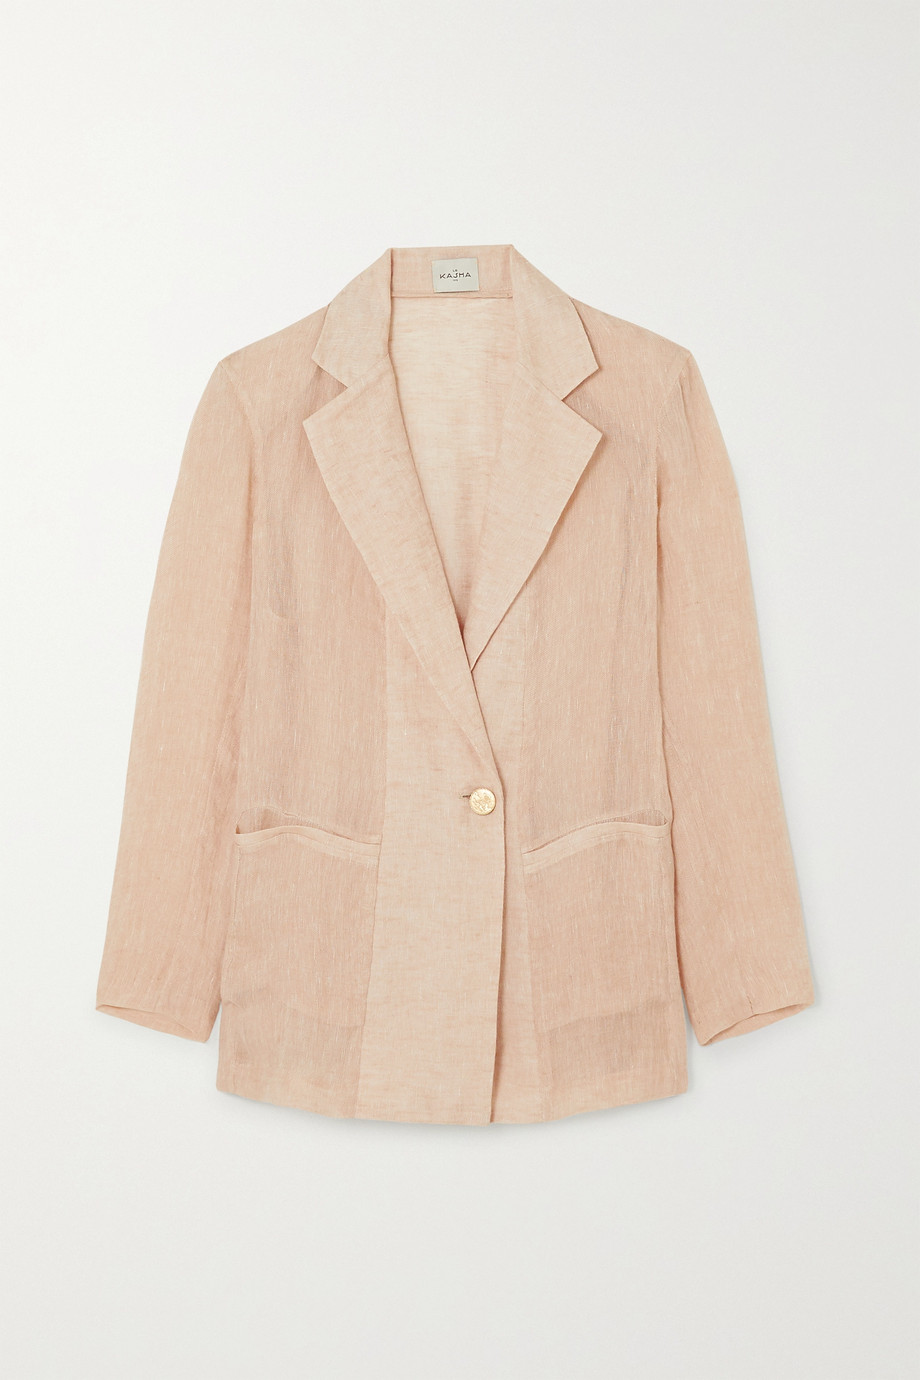 Le Kasha Tima linen blazer